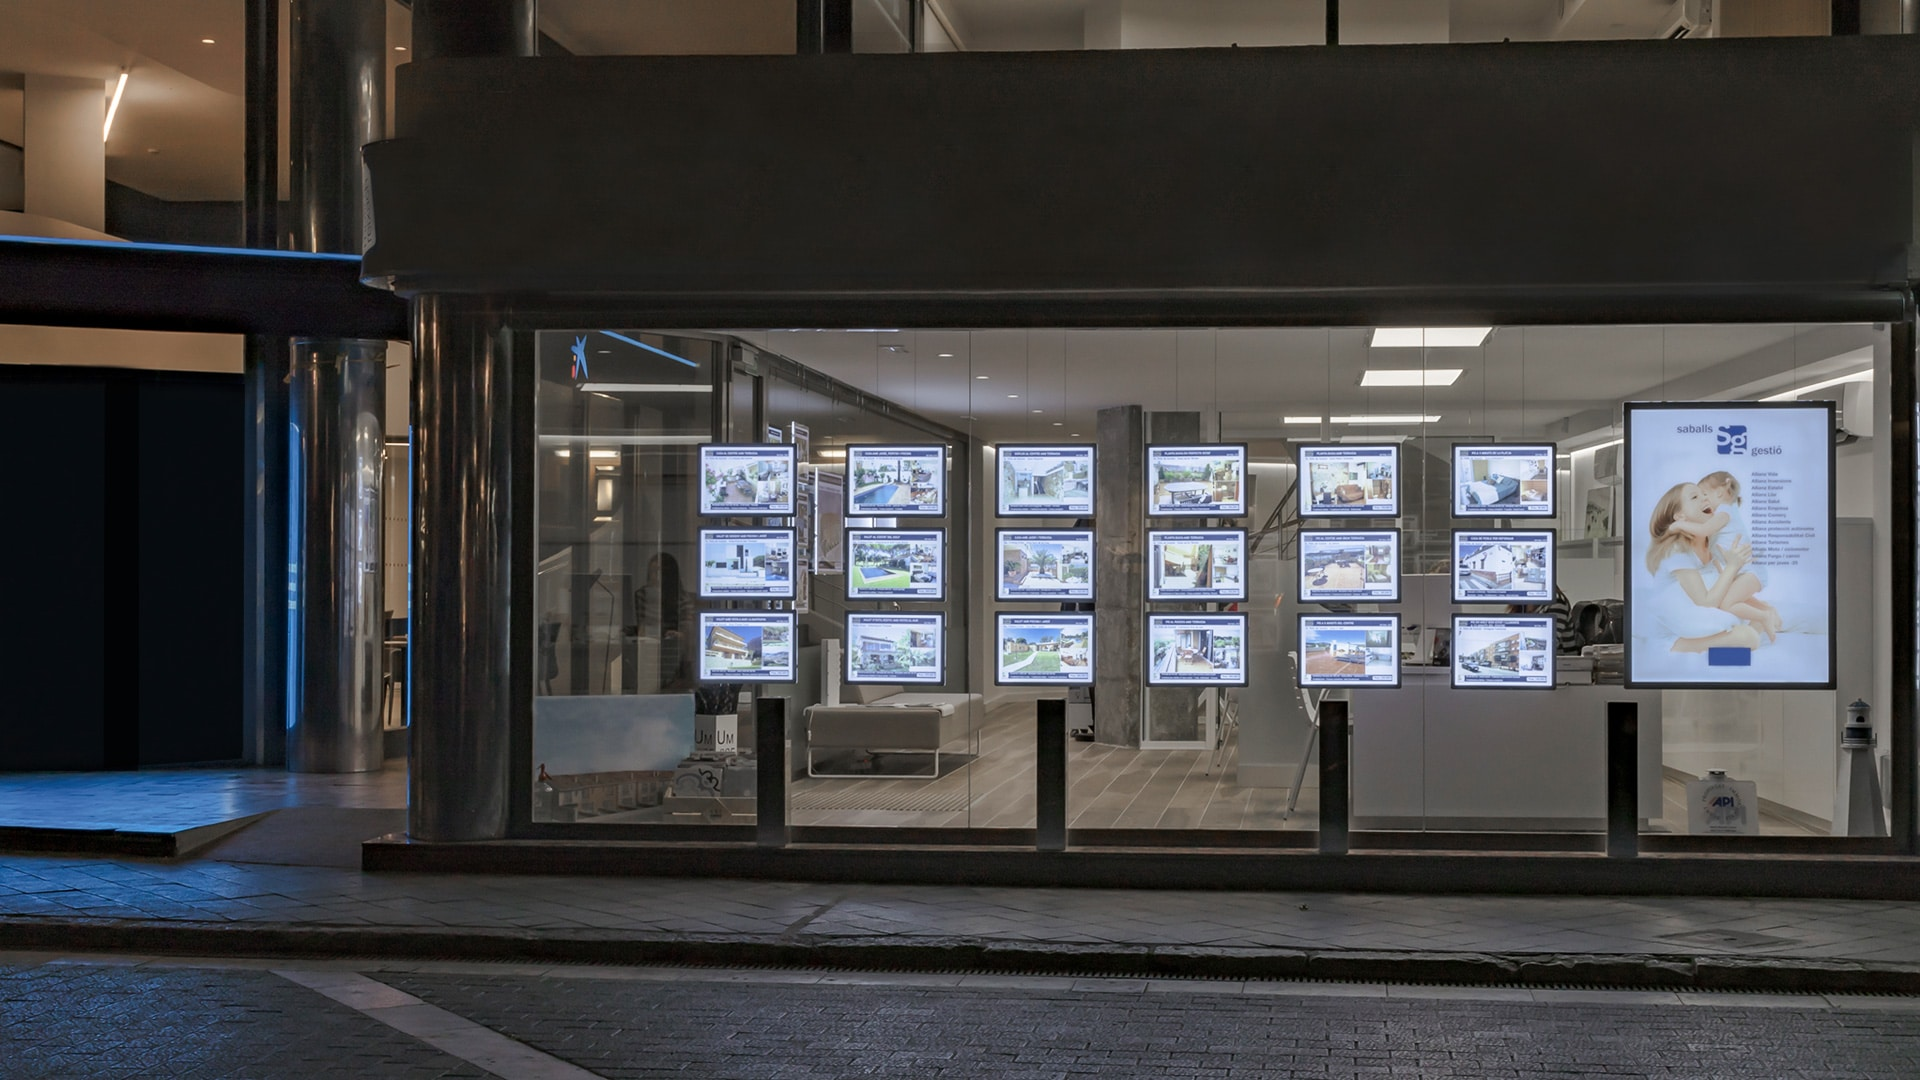 illuminez vitrinemedia